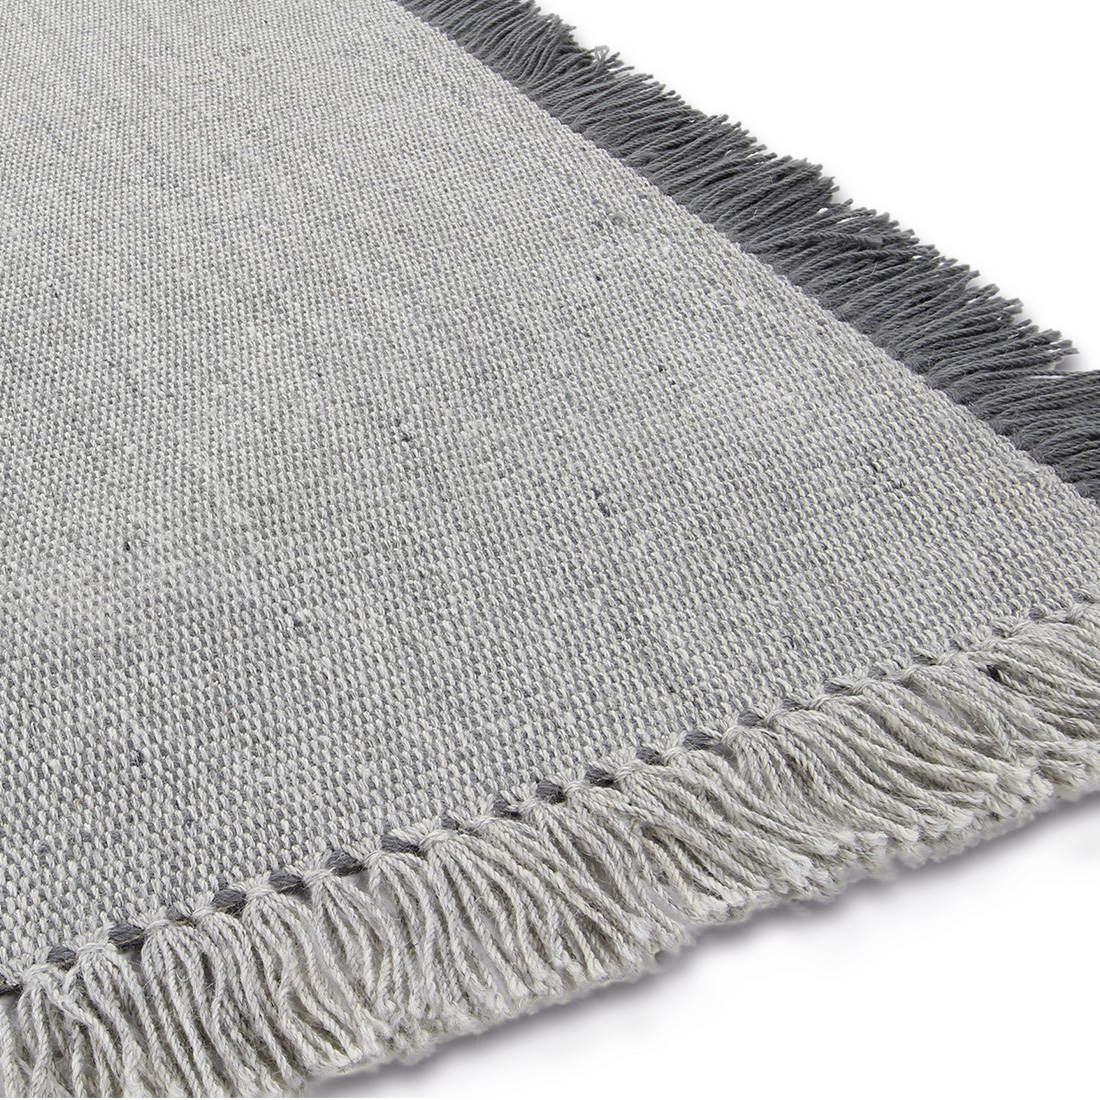 Vloerkleed Brinker Barrax Grey | 170 x 230 cm